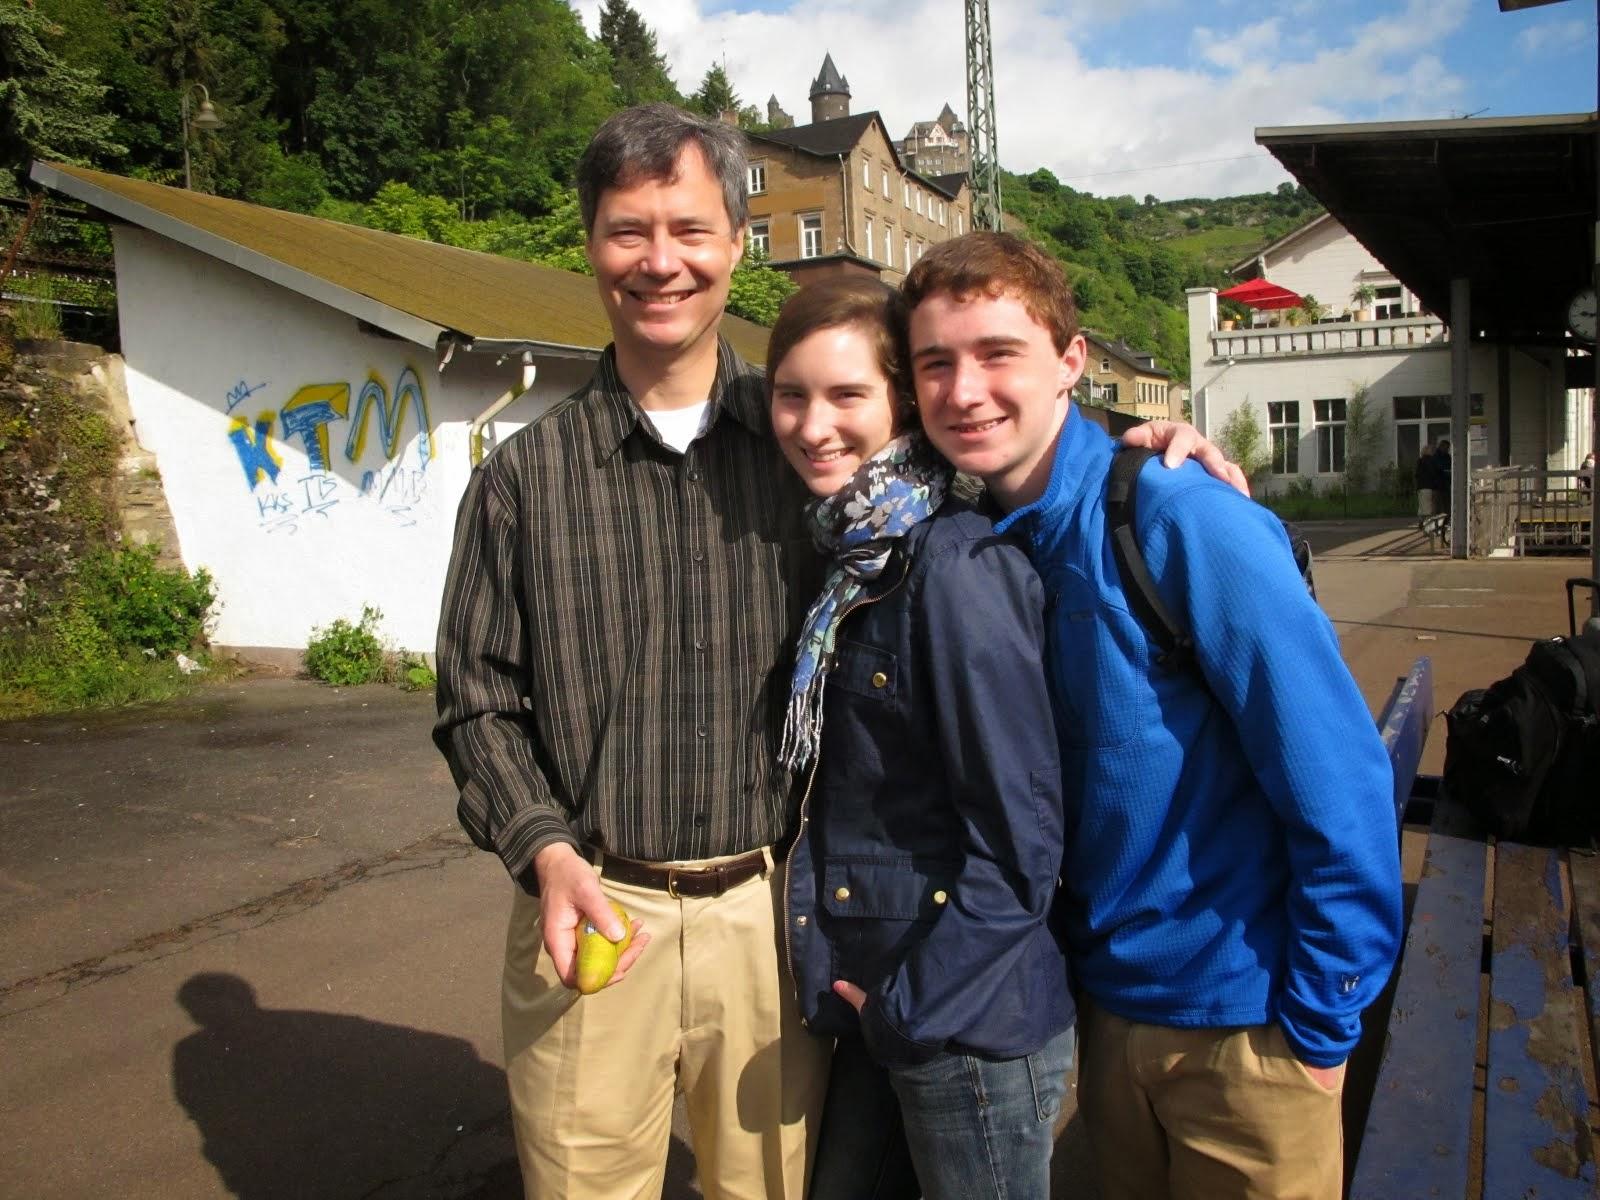 Caroline, David, and Len